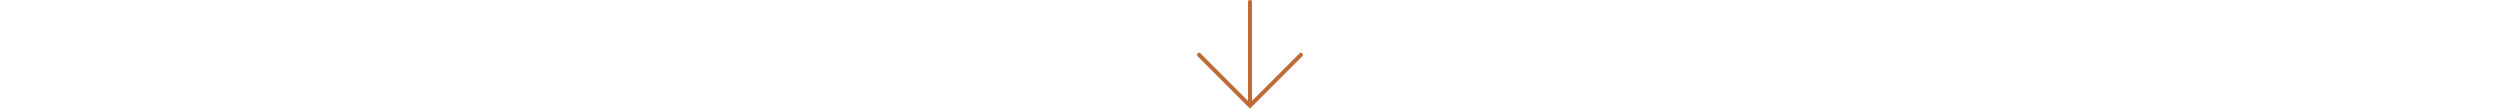 BO_intro_arrow.jpg